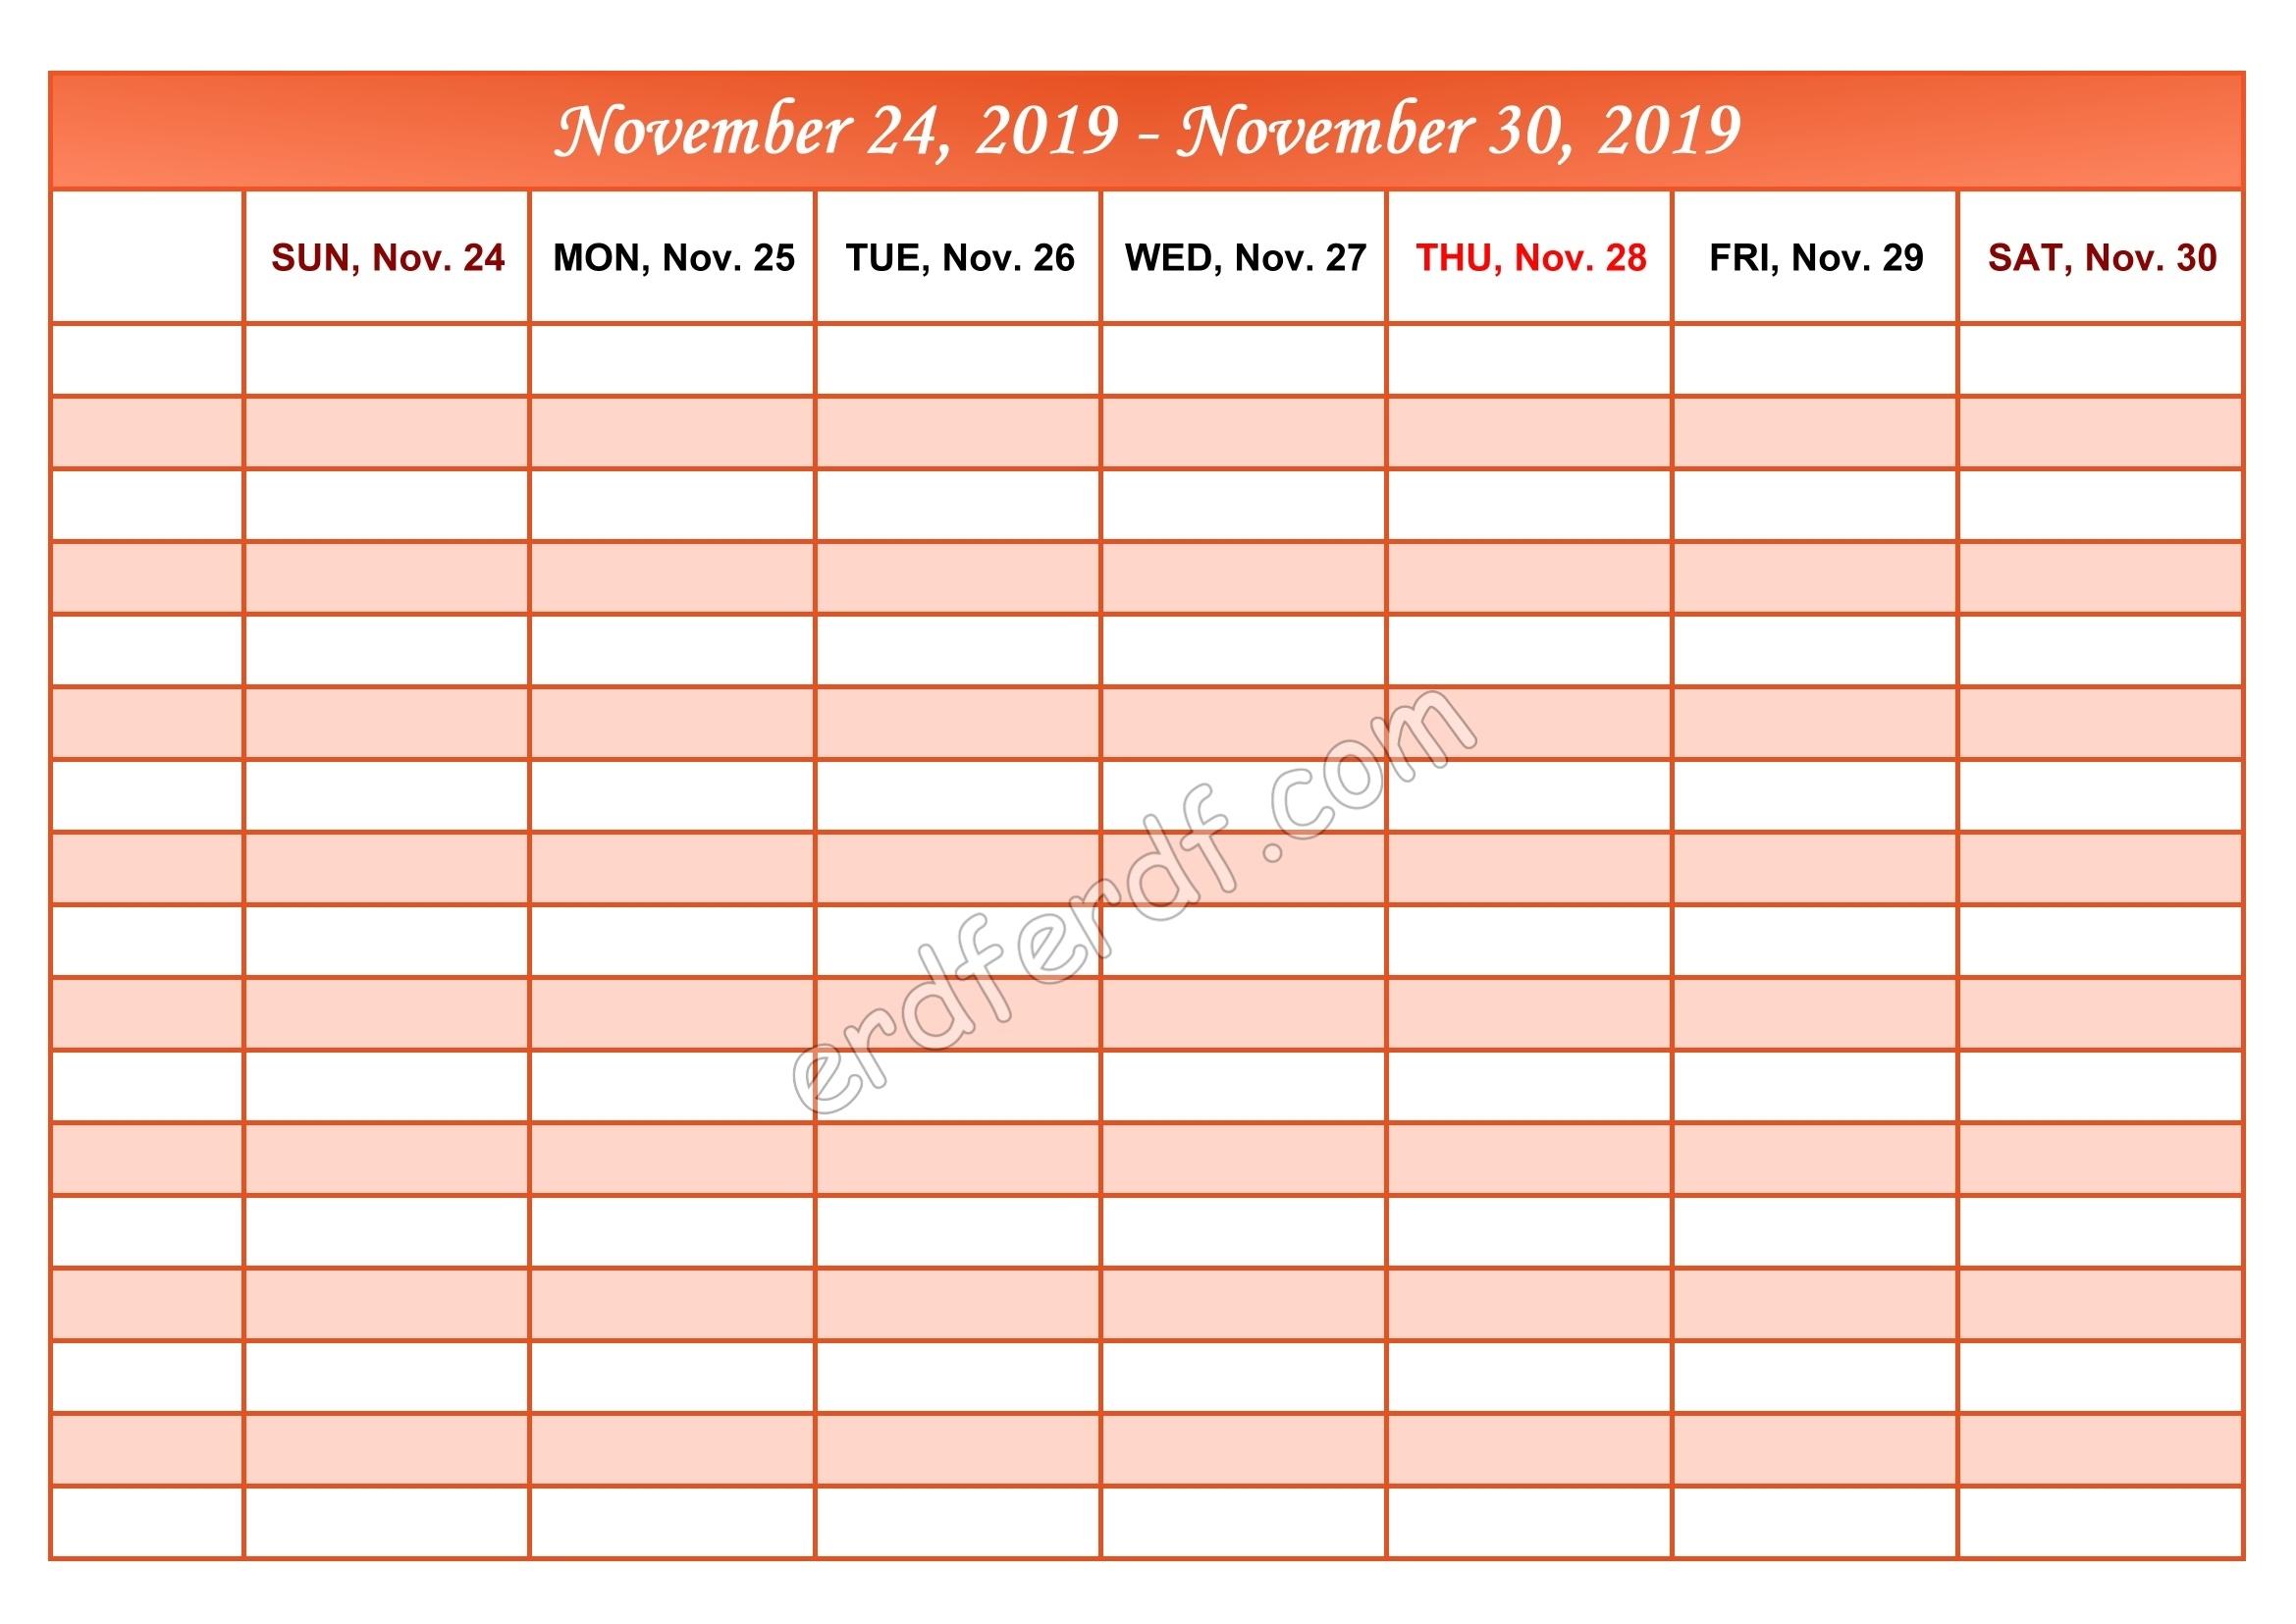 Printable Daily Calendars With Time | Printable Calendar regarding Printable Calendar With Time Slots